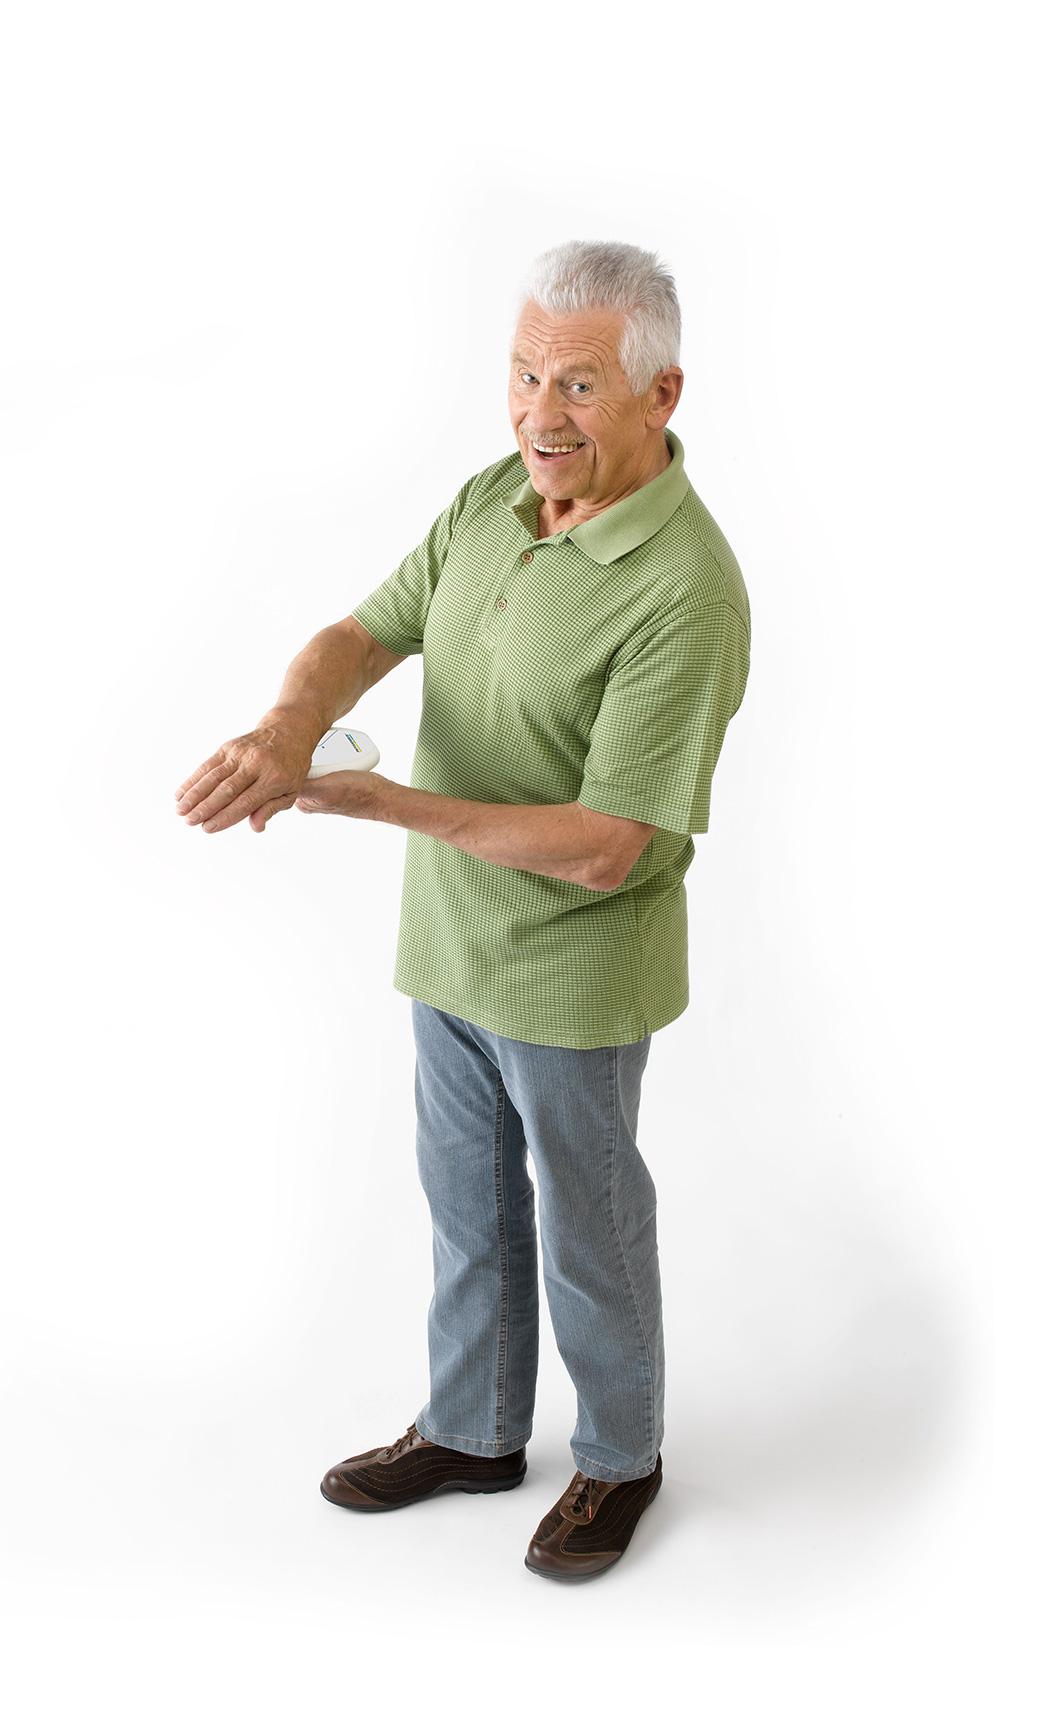 MAGCELL ATHRO Anwendung Beispiel, Mann hält sich Gerät an das Handgelenk und lächelt